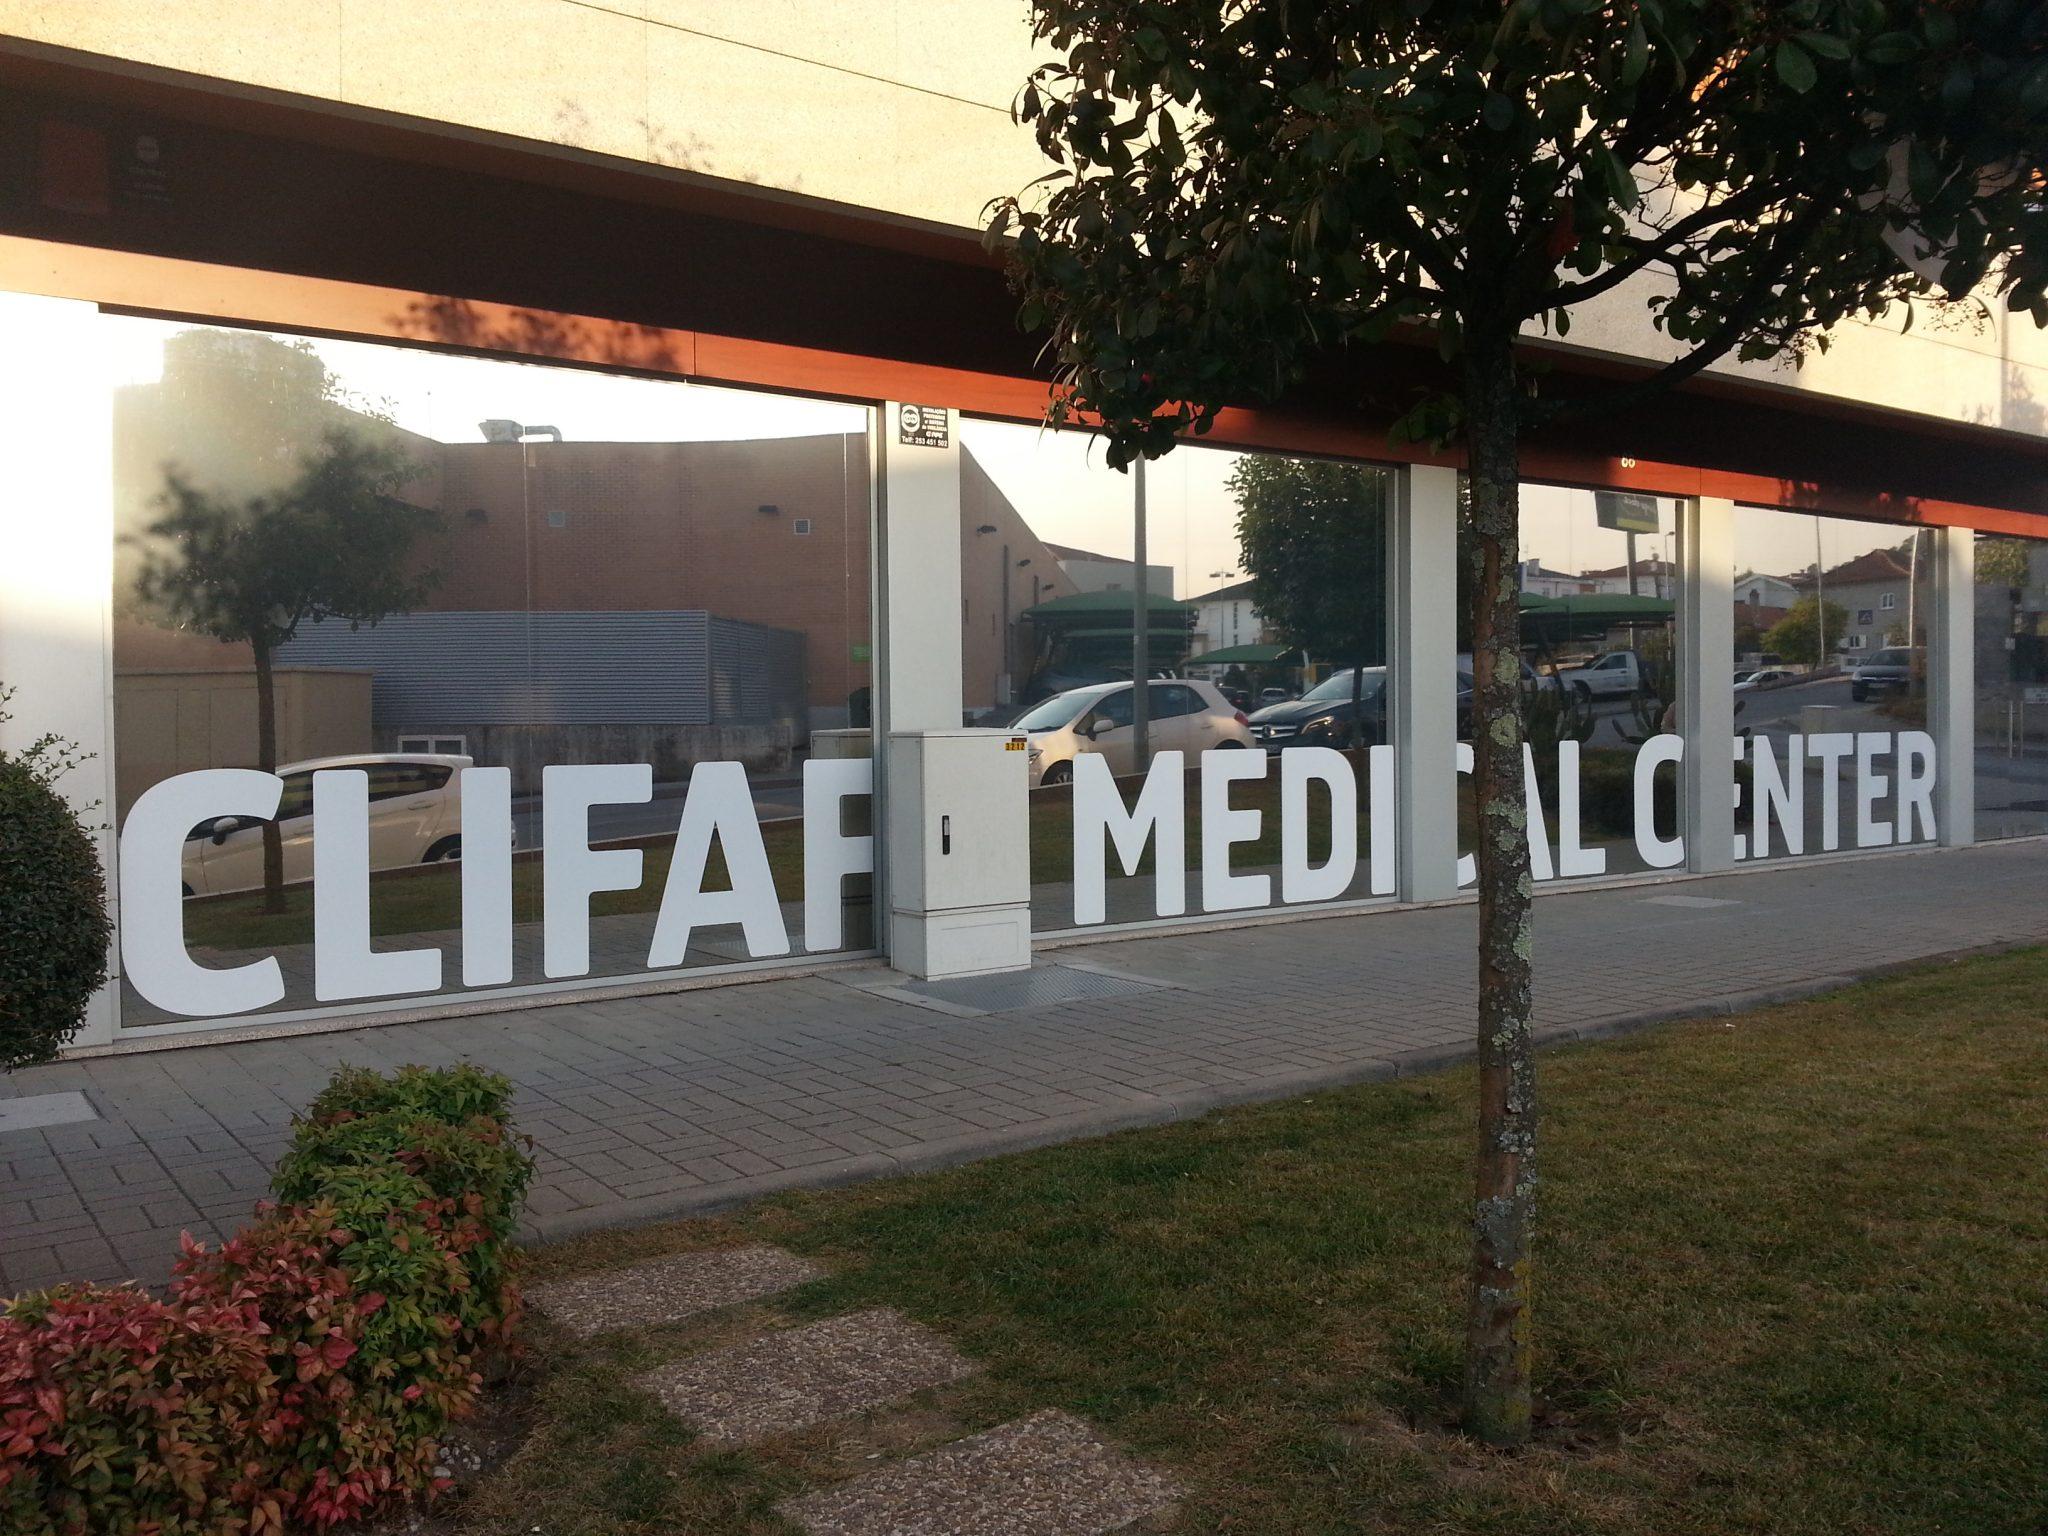 Clifafe Yield saúde PME LIDER 2018